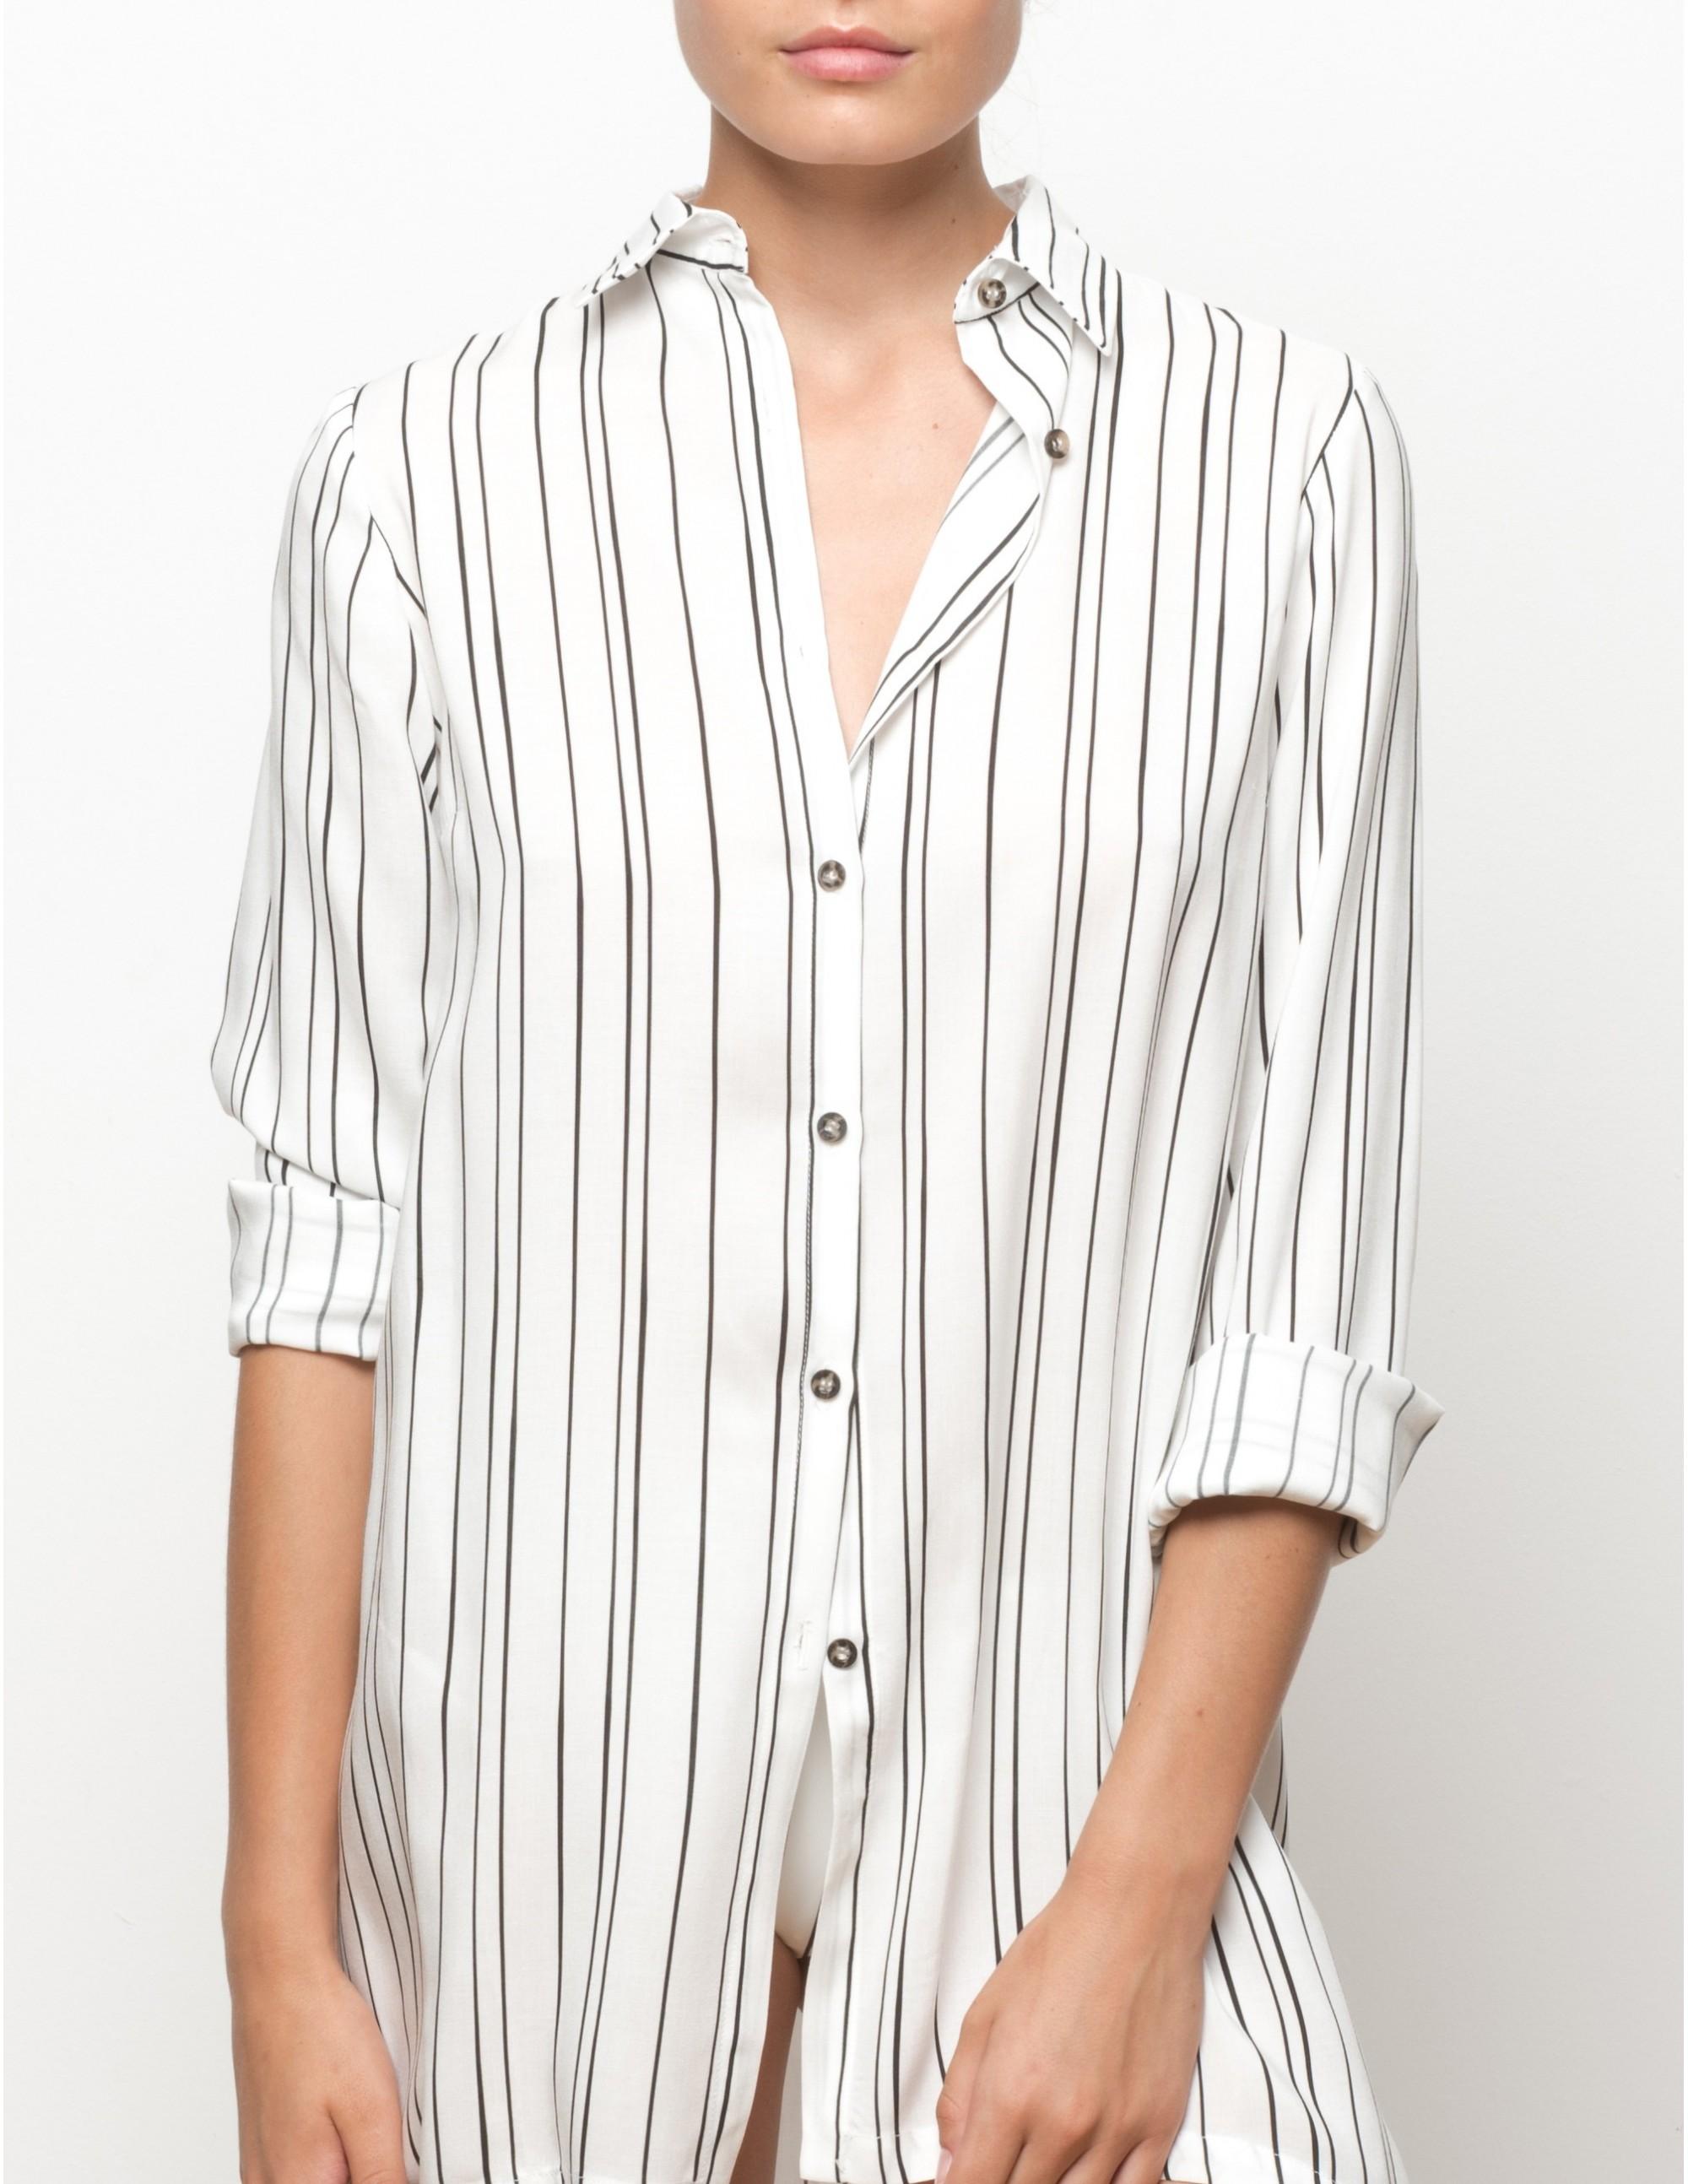 KIGO shirt - LIMITLESS